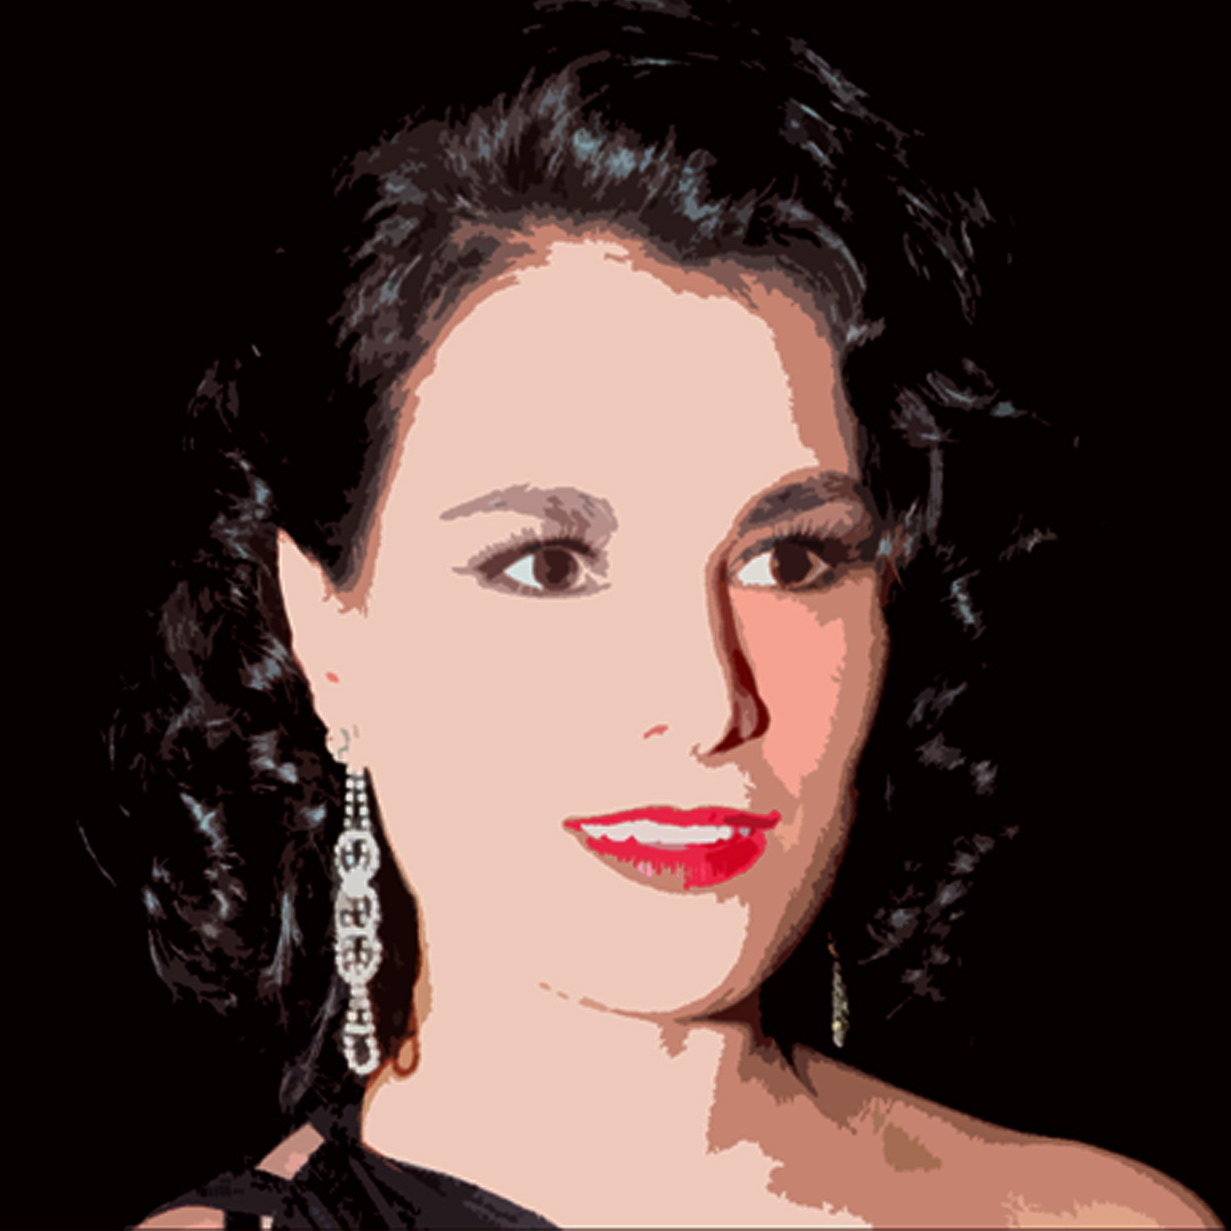 Ava lookalike_cutout.jpg